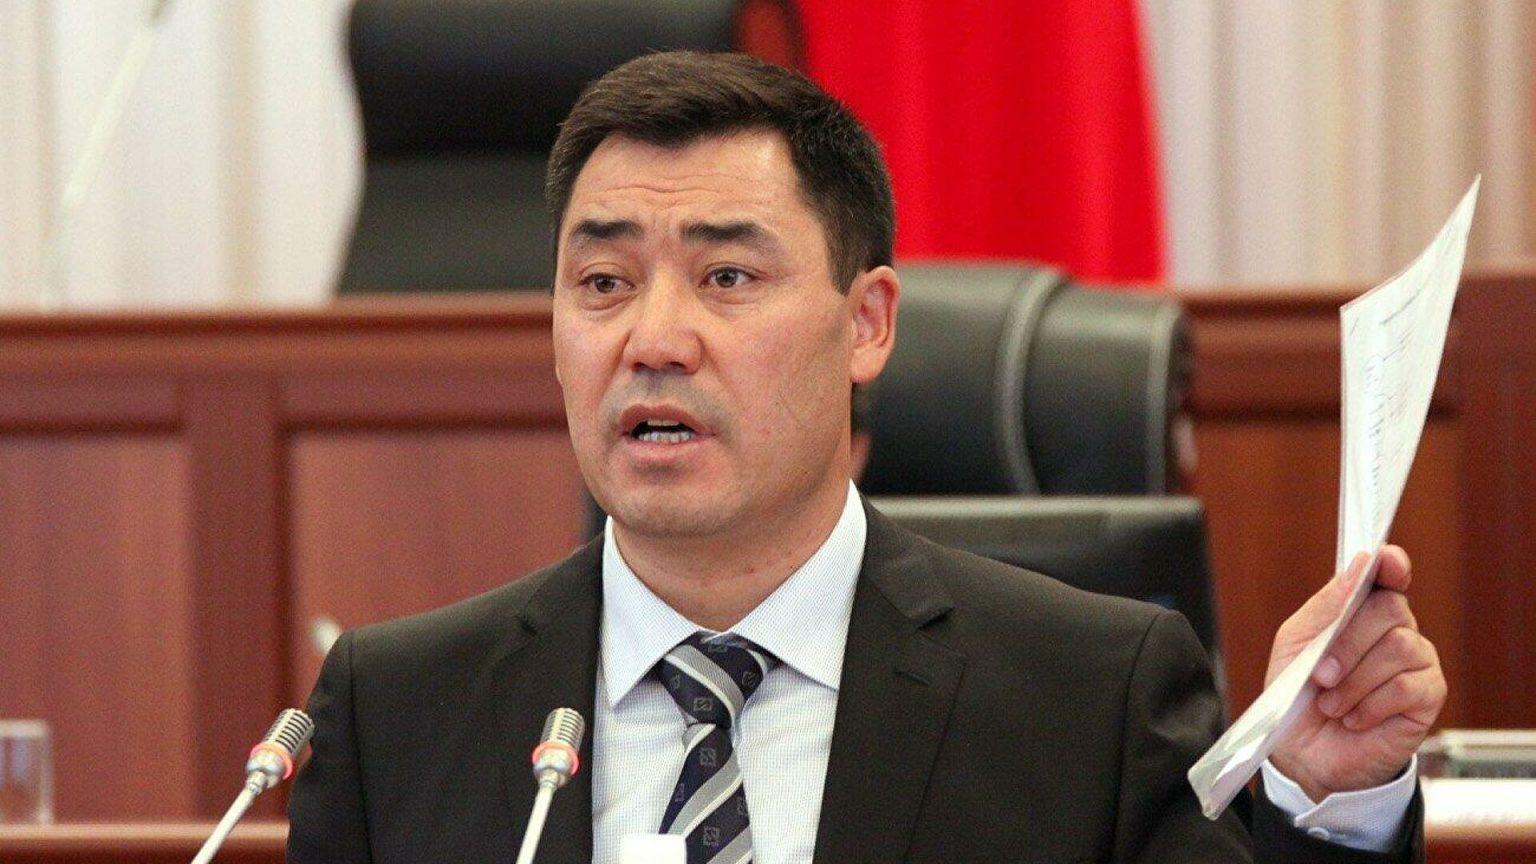 «Узбекистан опередил нас на 40-50 лет» — Садыр Жапаров